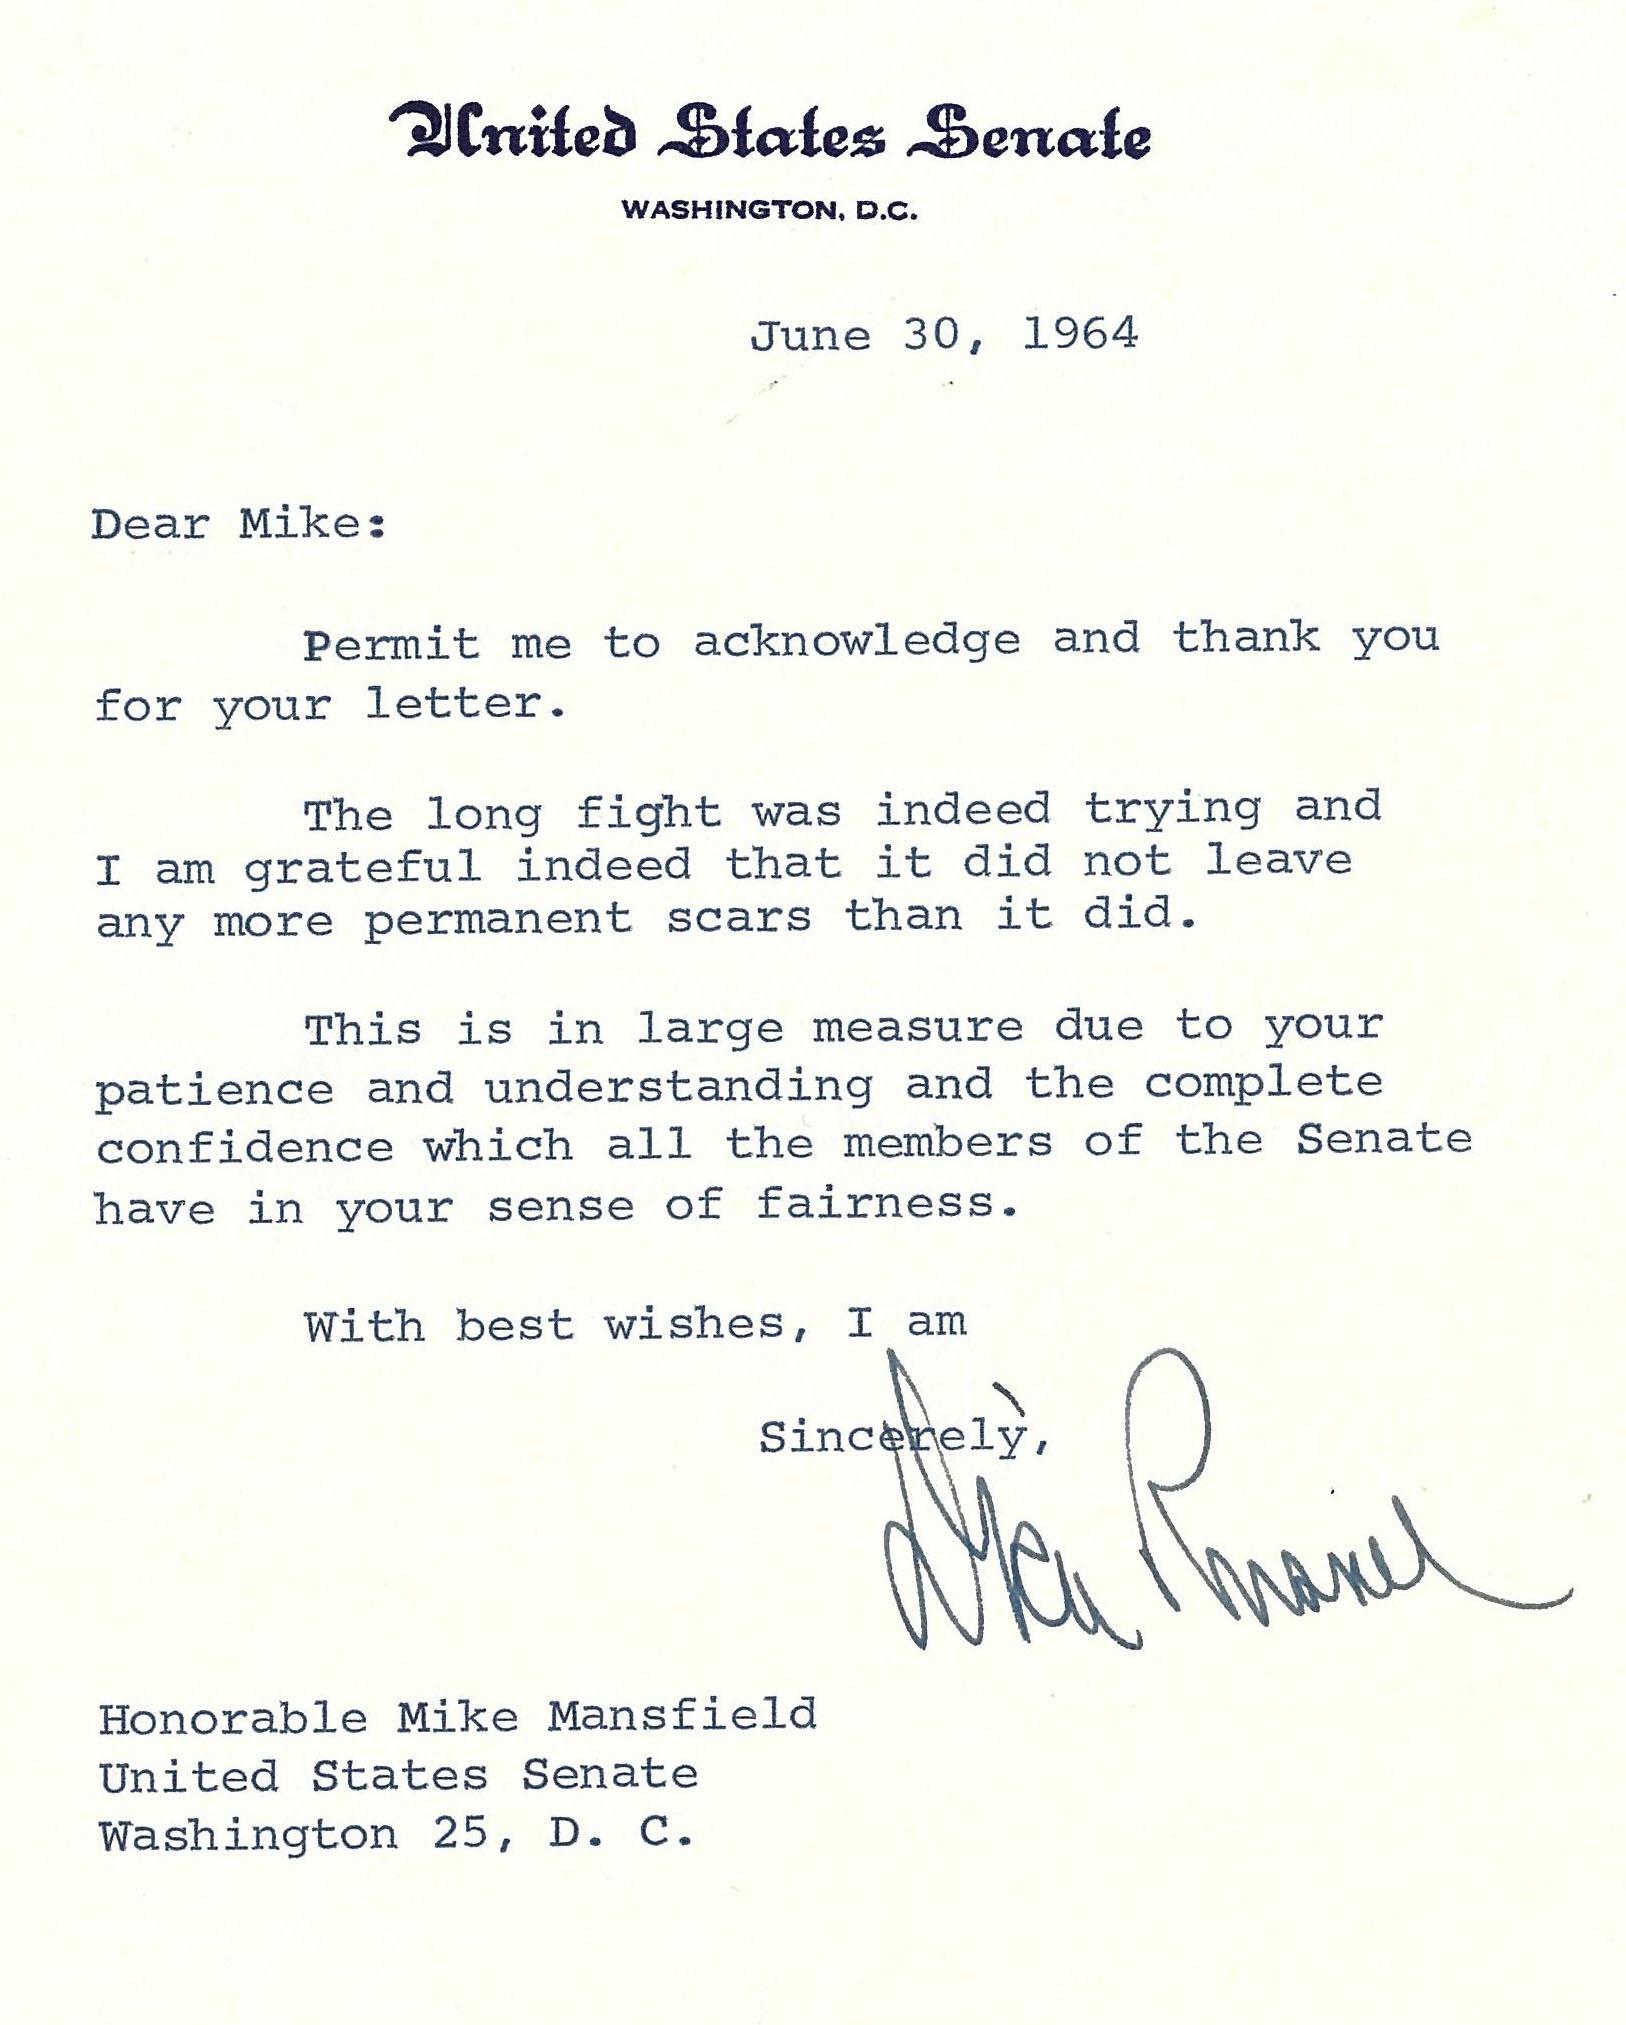 Note to Senator Mike Mansfield from Senator Richard Russell, June 30, 1964